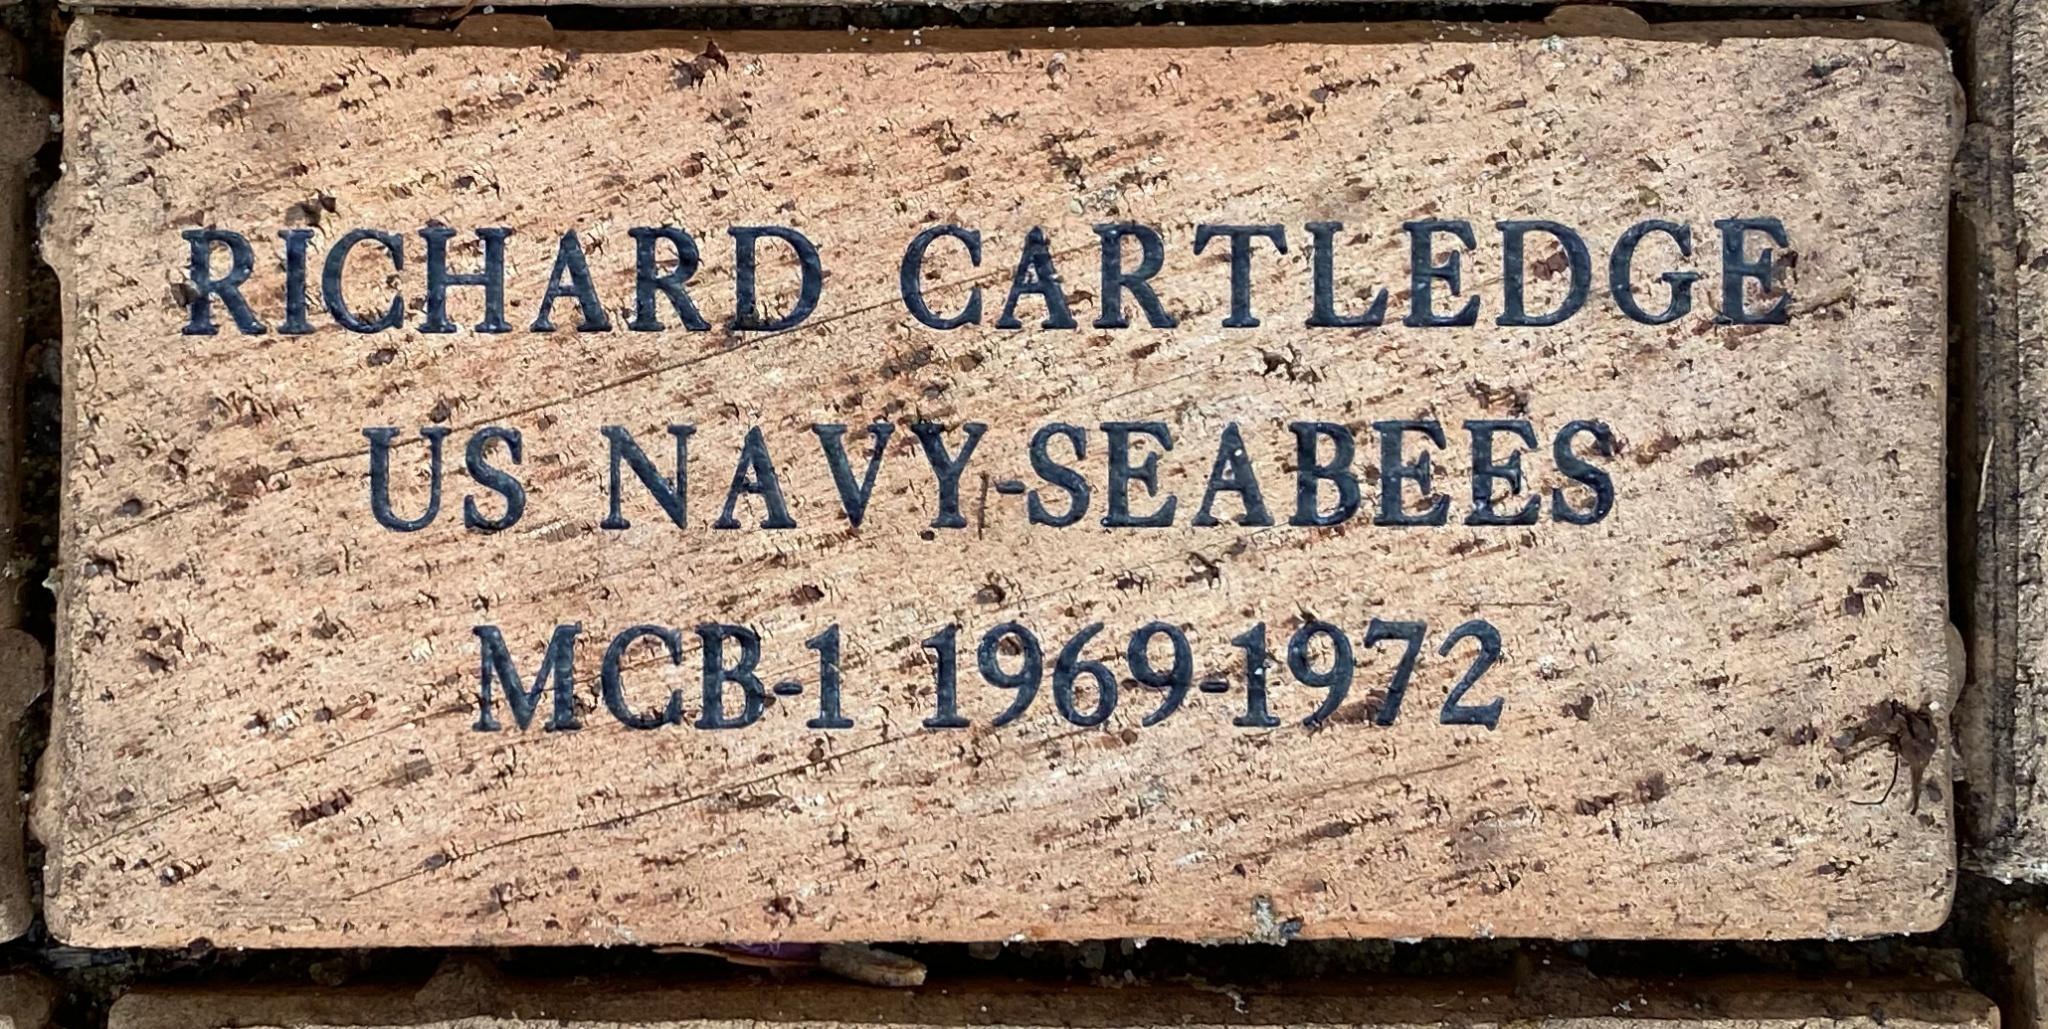 RICHARD CARTLEDGE US NAVY –SEABEES MCB-1 1969-1972